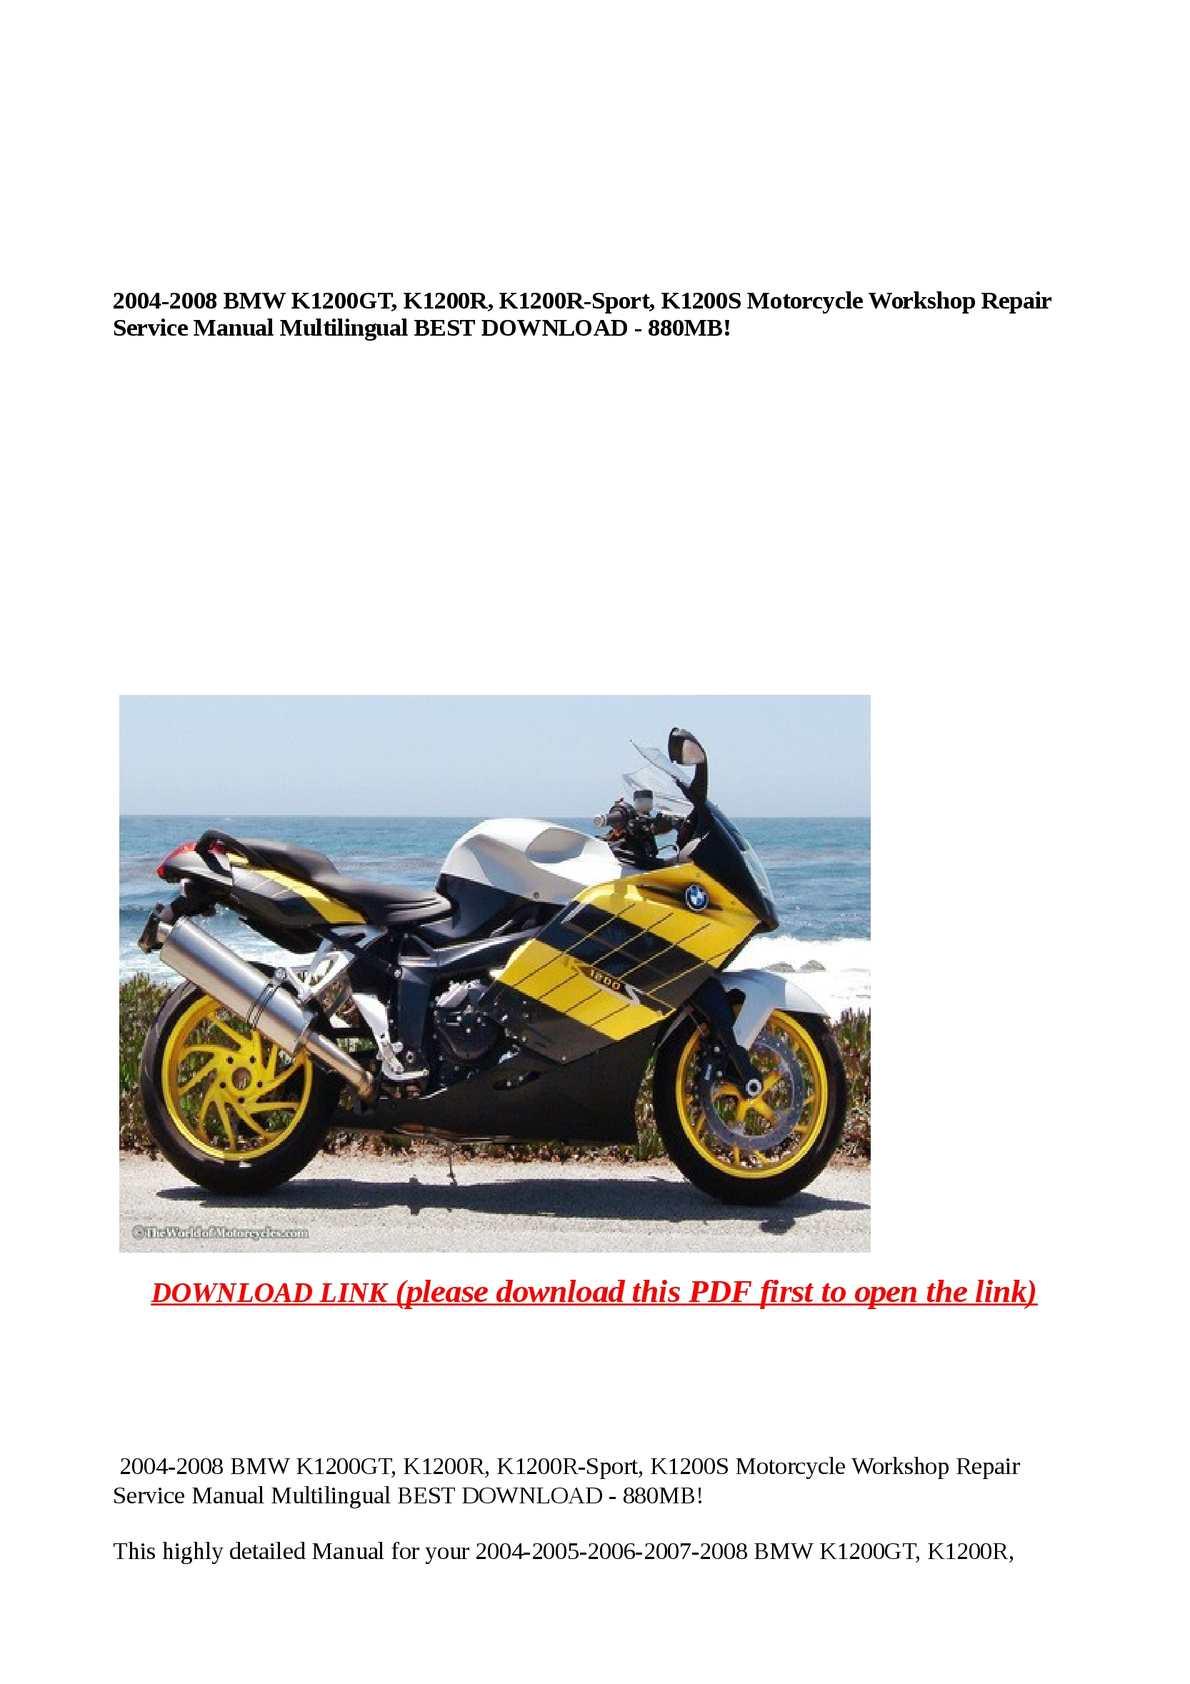 calaméo 2004 2008 bmw k1200gt k1200r k1200r sport k1200s calaméo 2004 2008 bmw k1200gt k1200r k1200r sport k1200s motorcycle workshop repair s